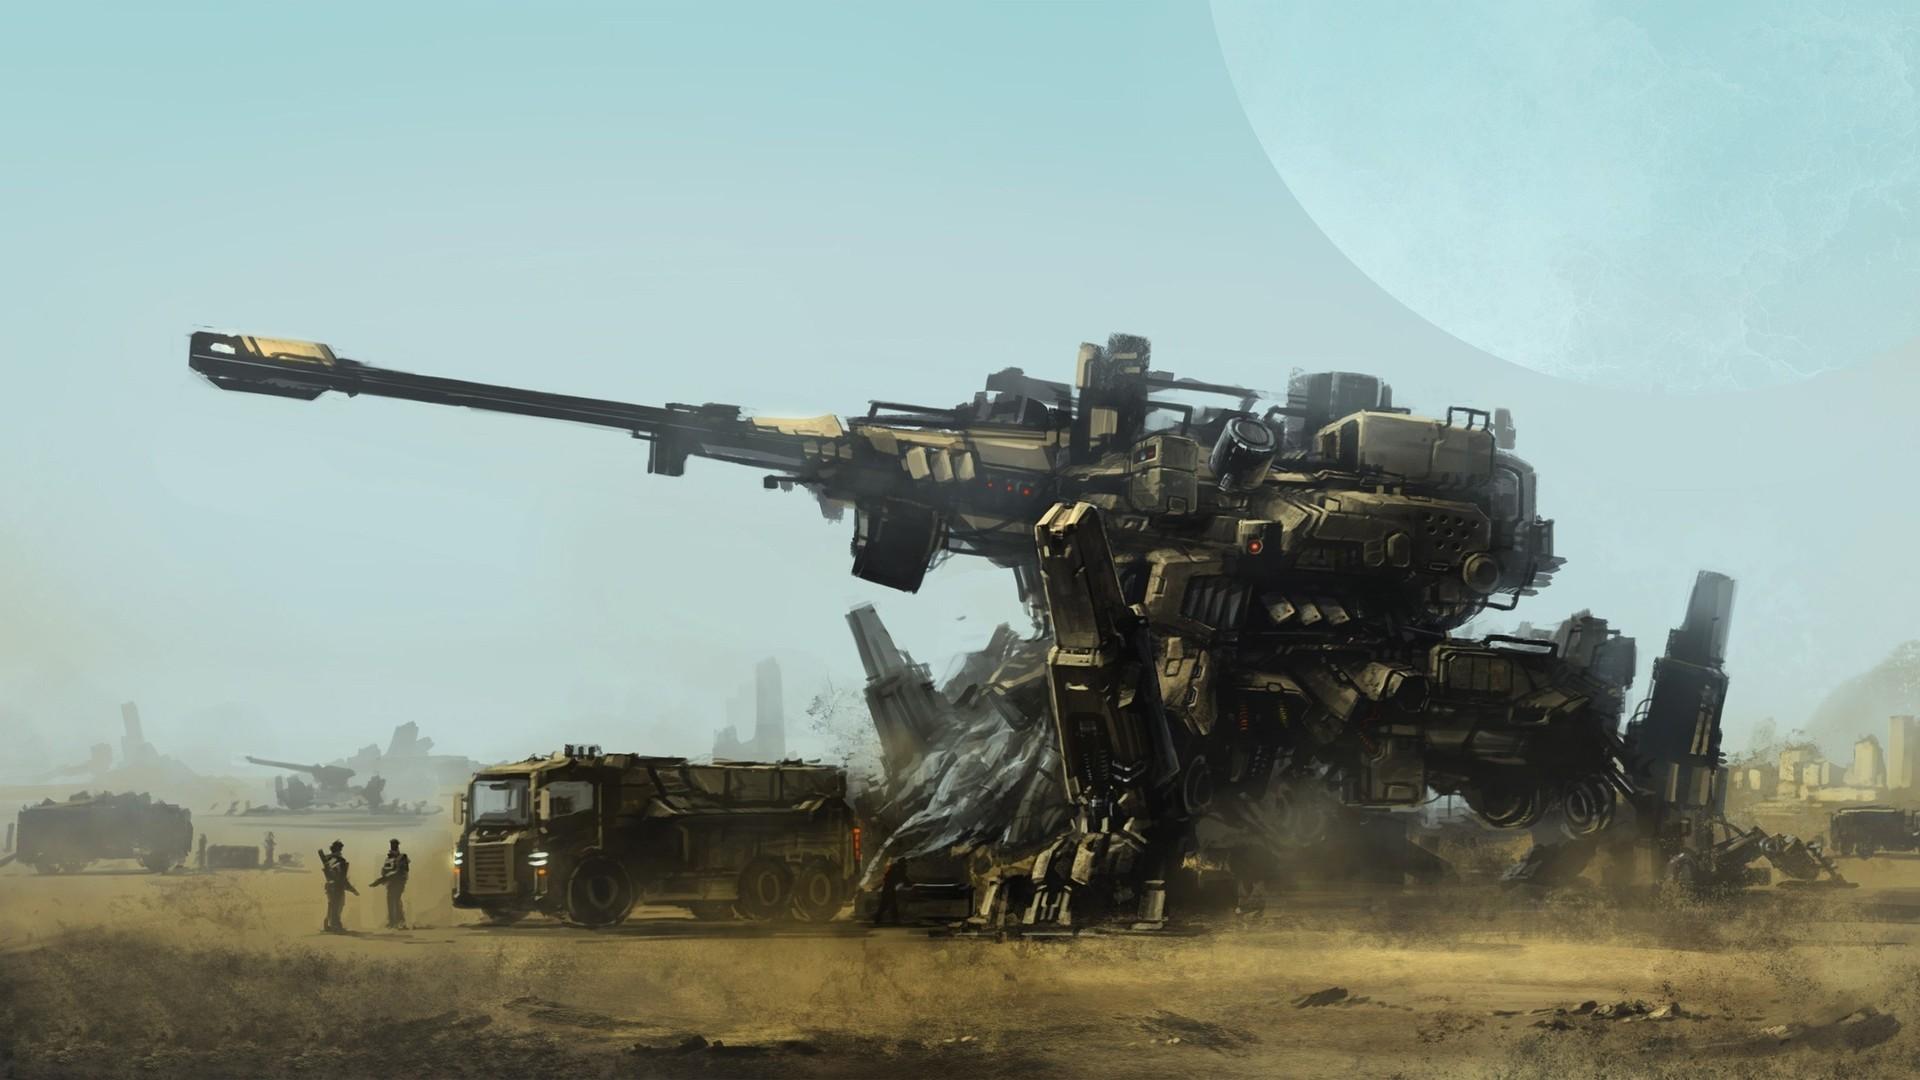 Vehicles War Vehicles Action Hd Military Images Fire: Fondos De Pantalla : Futurista, Vehículo, Guerra, Arma